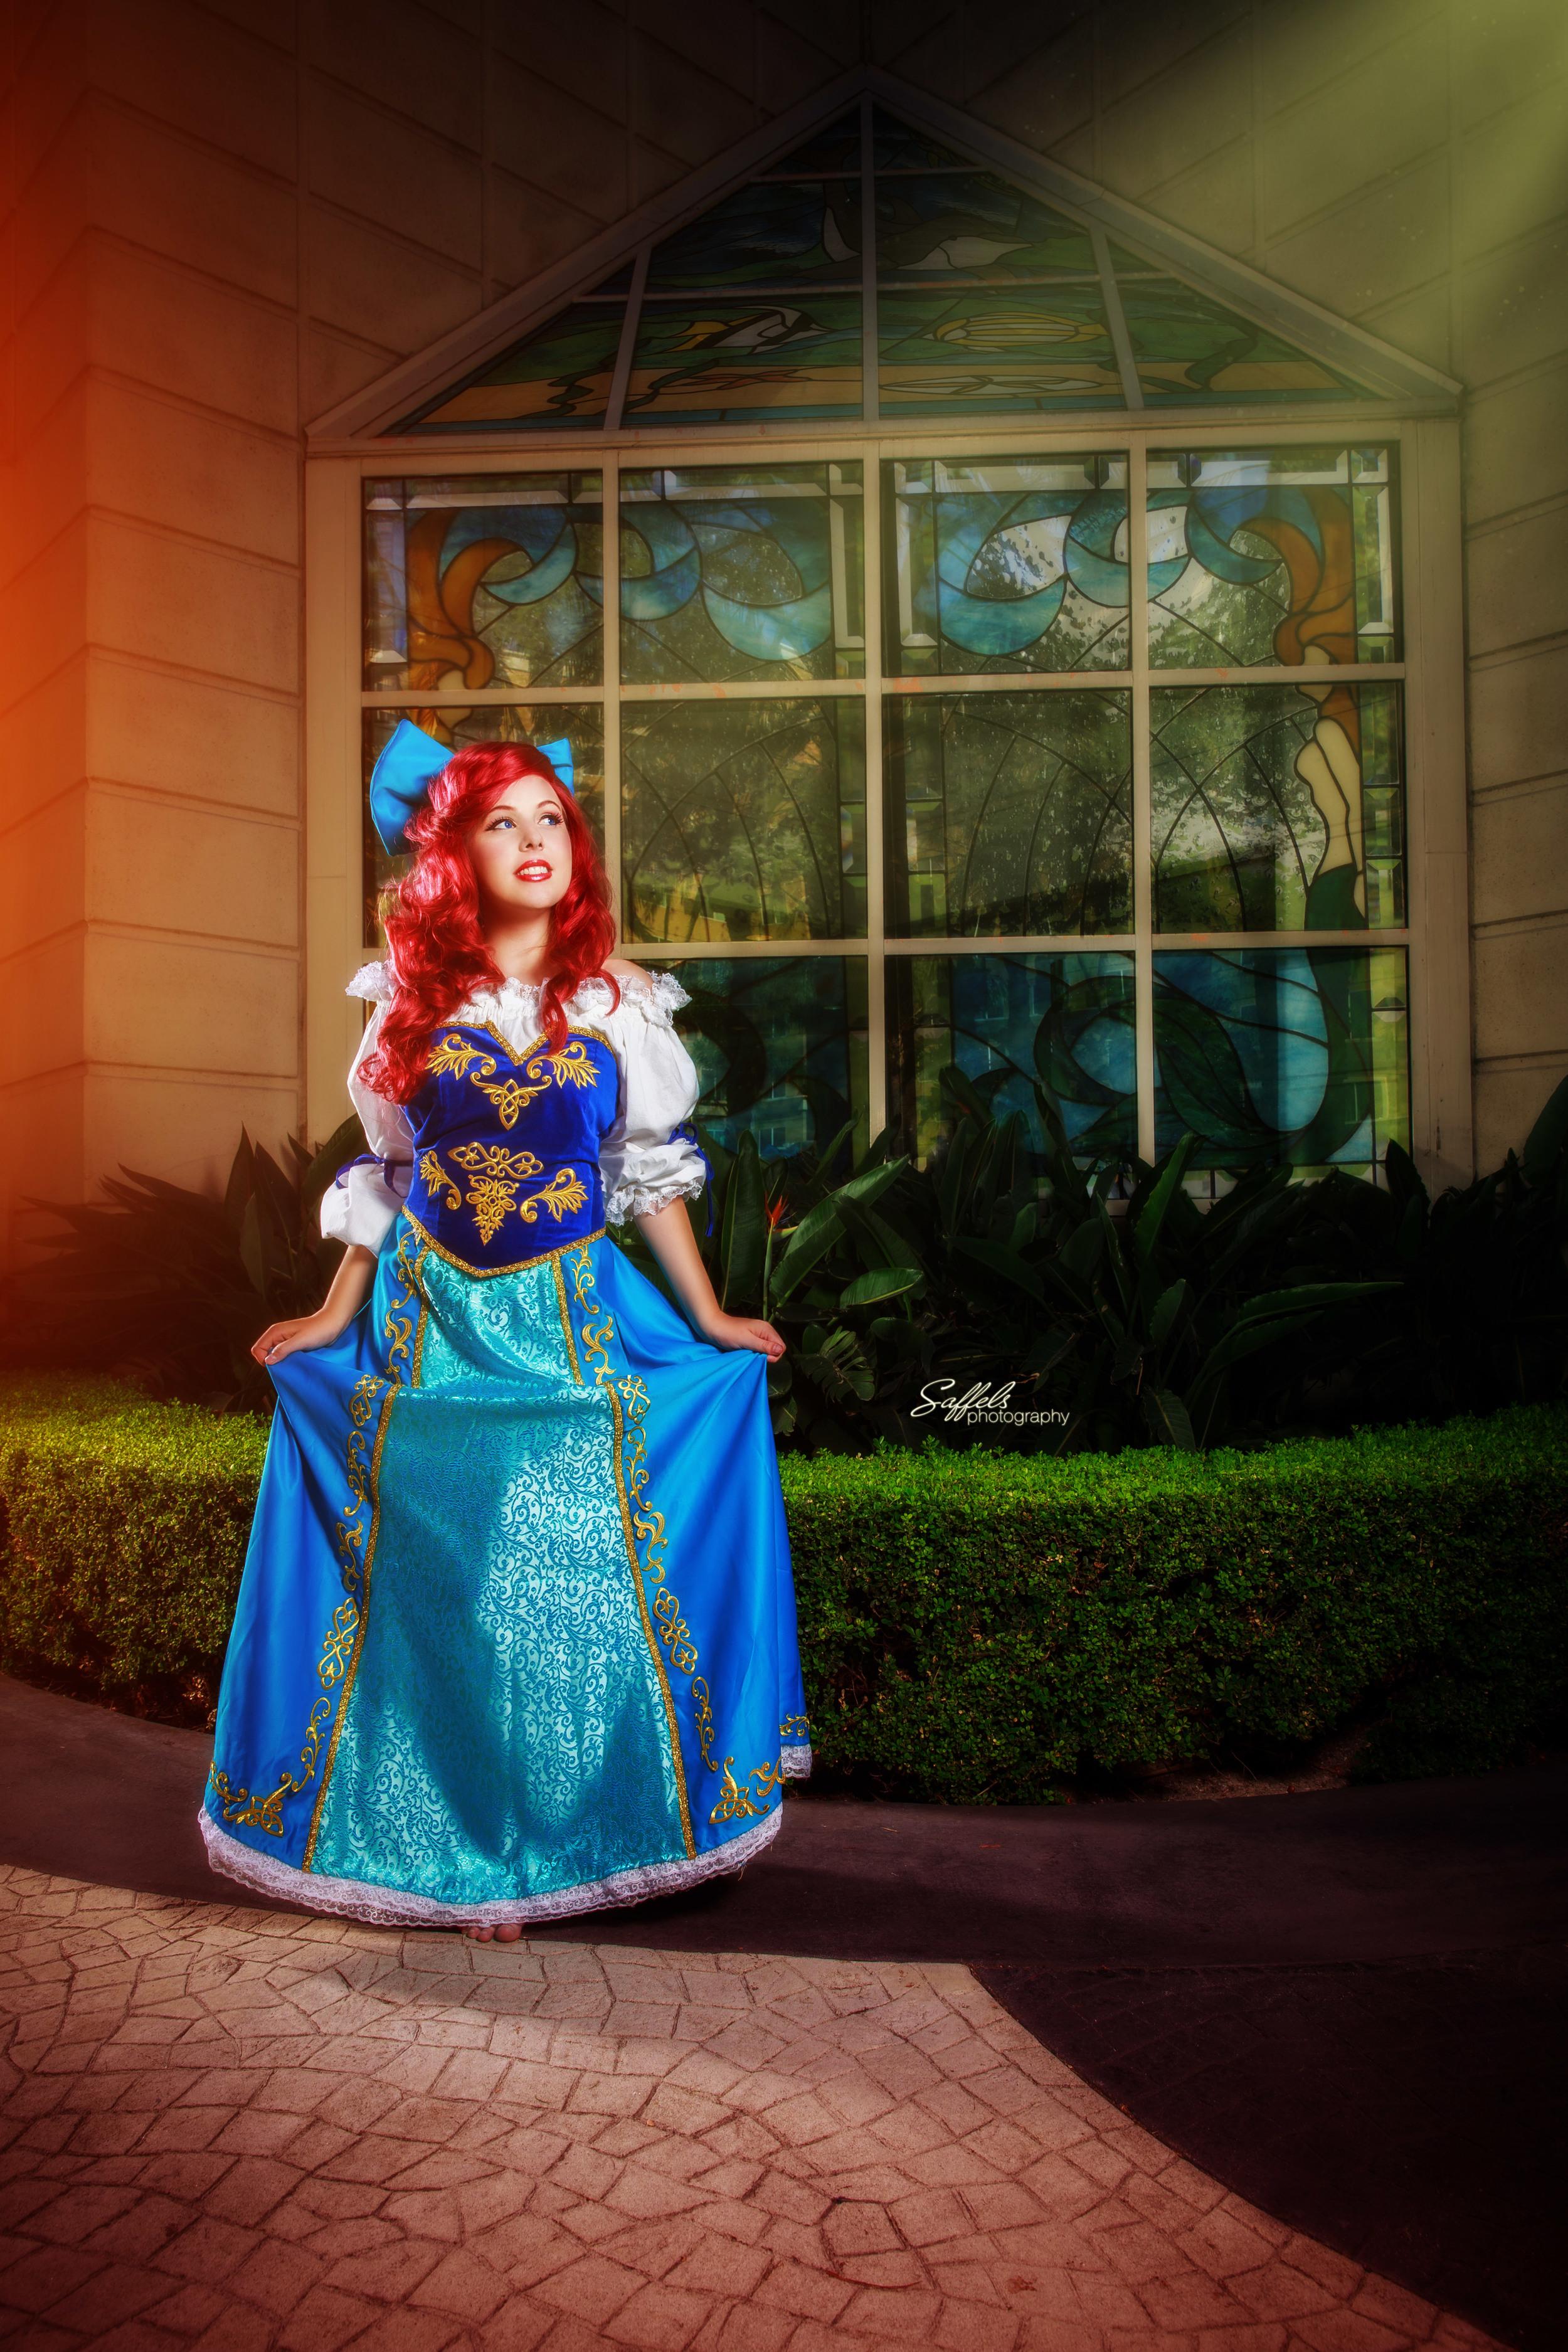 Courtoon as Ariel